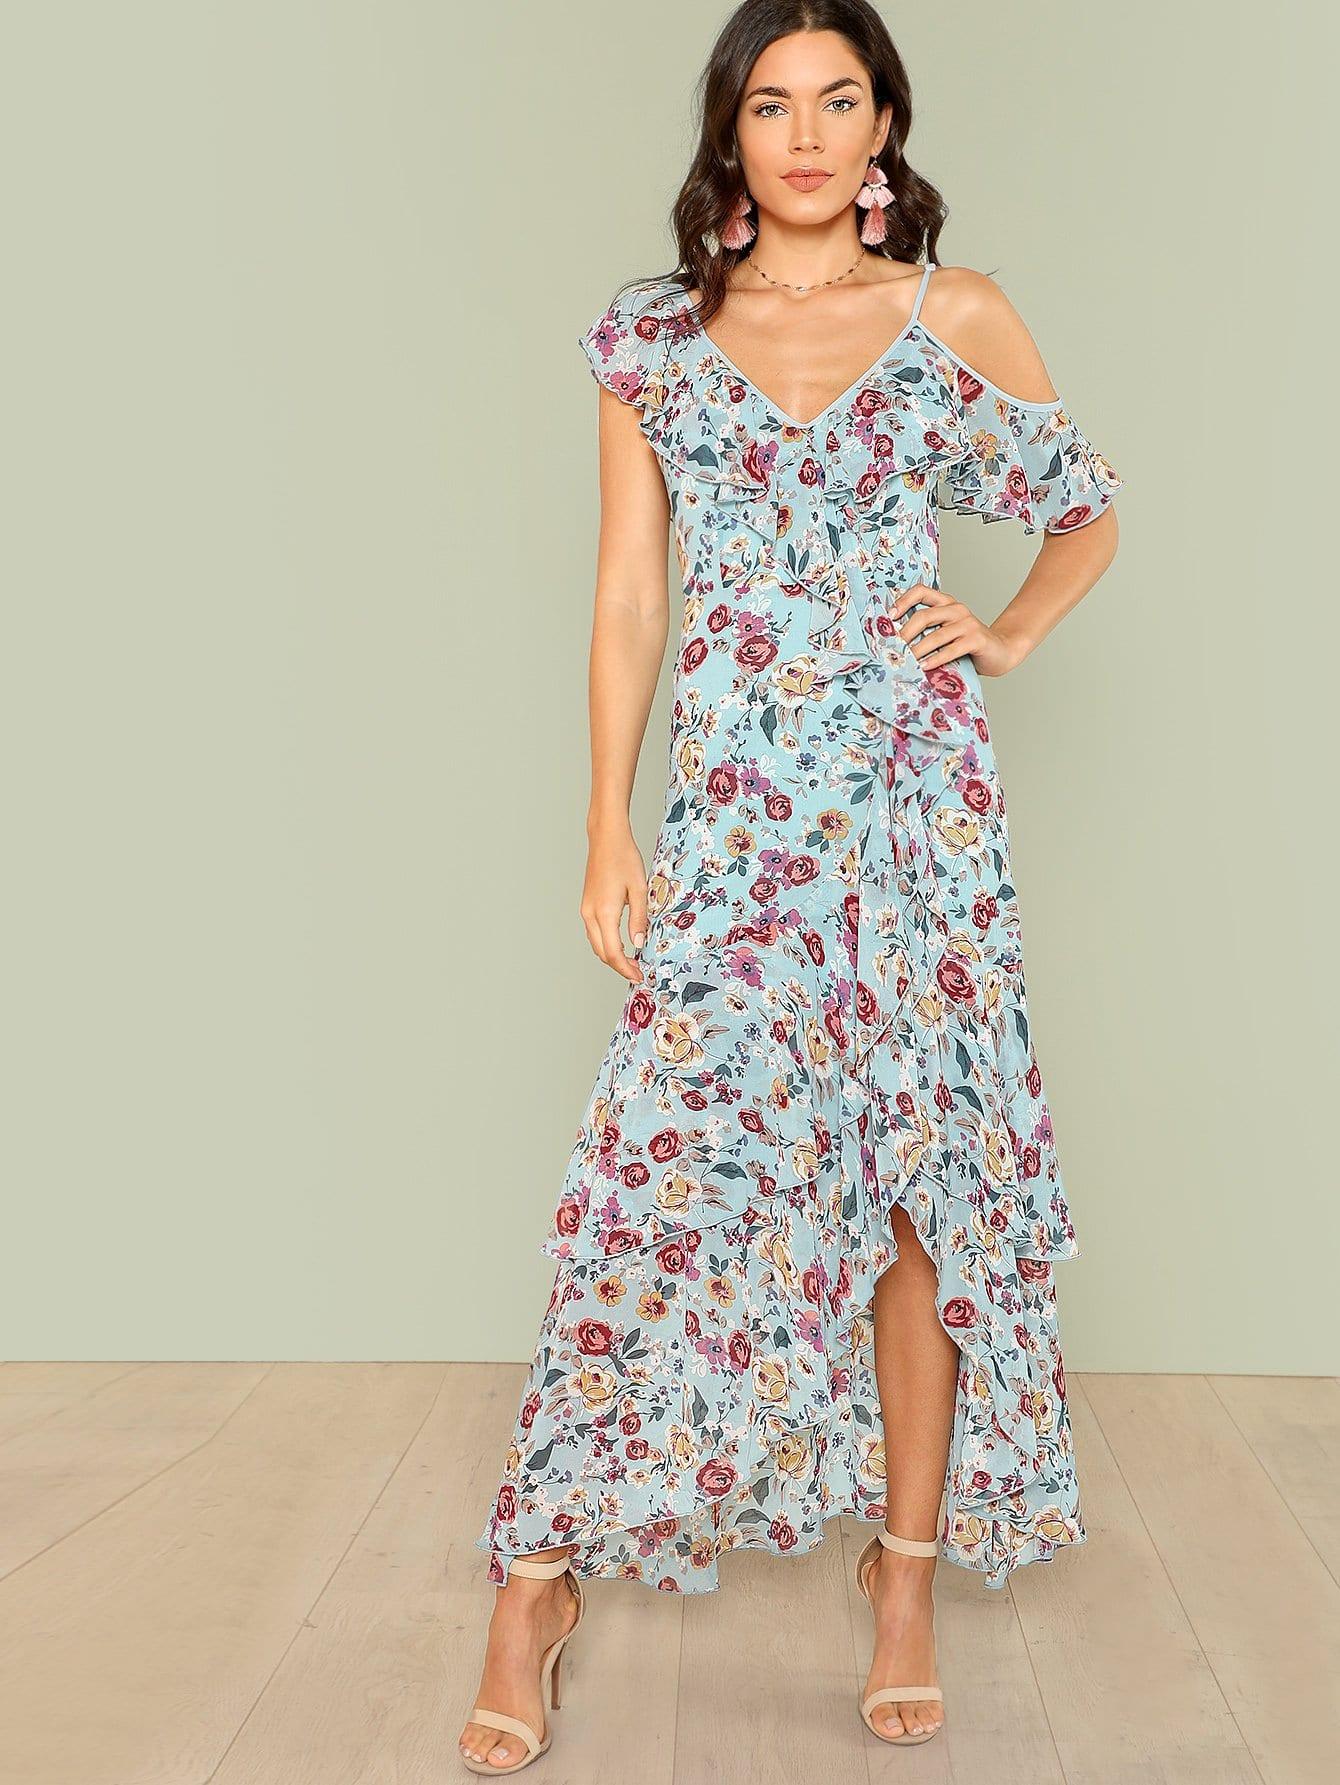 Flower Print Ruffle Hem Dress flower print ruffle hem top